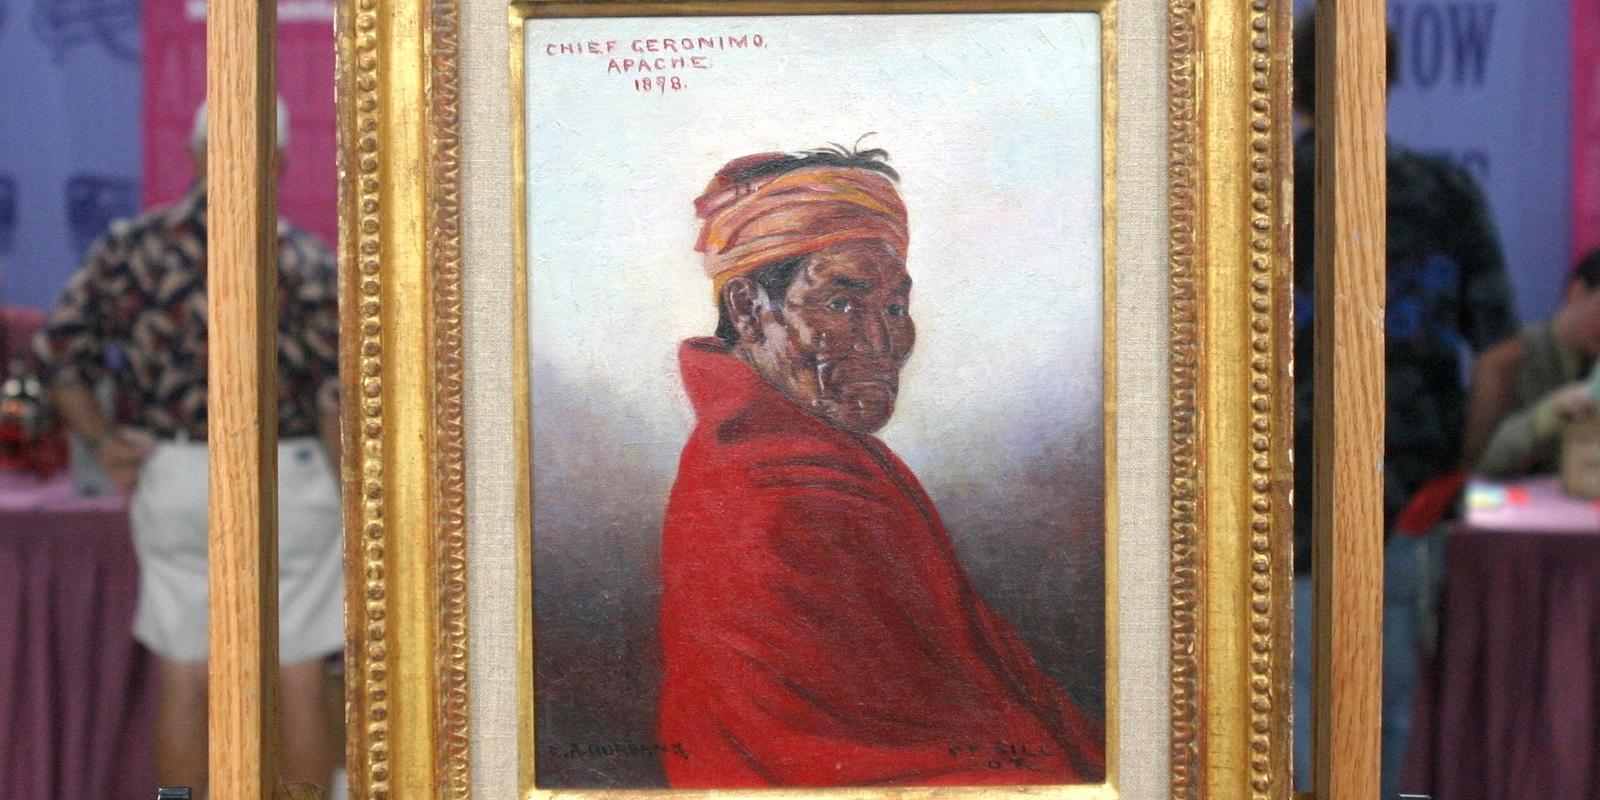 https://www-tc.pbs.org/prod-media/antiques-roadshow/article/images/Geronimo_AR-OKC-808-1600x800.jpg